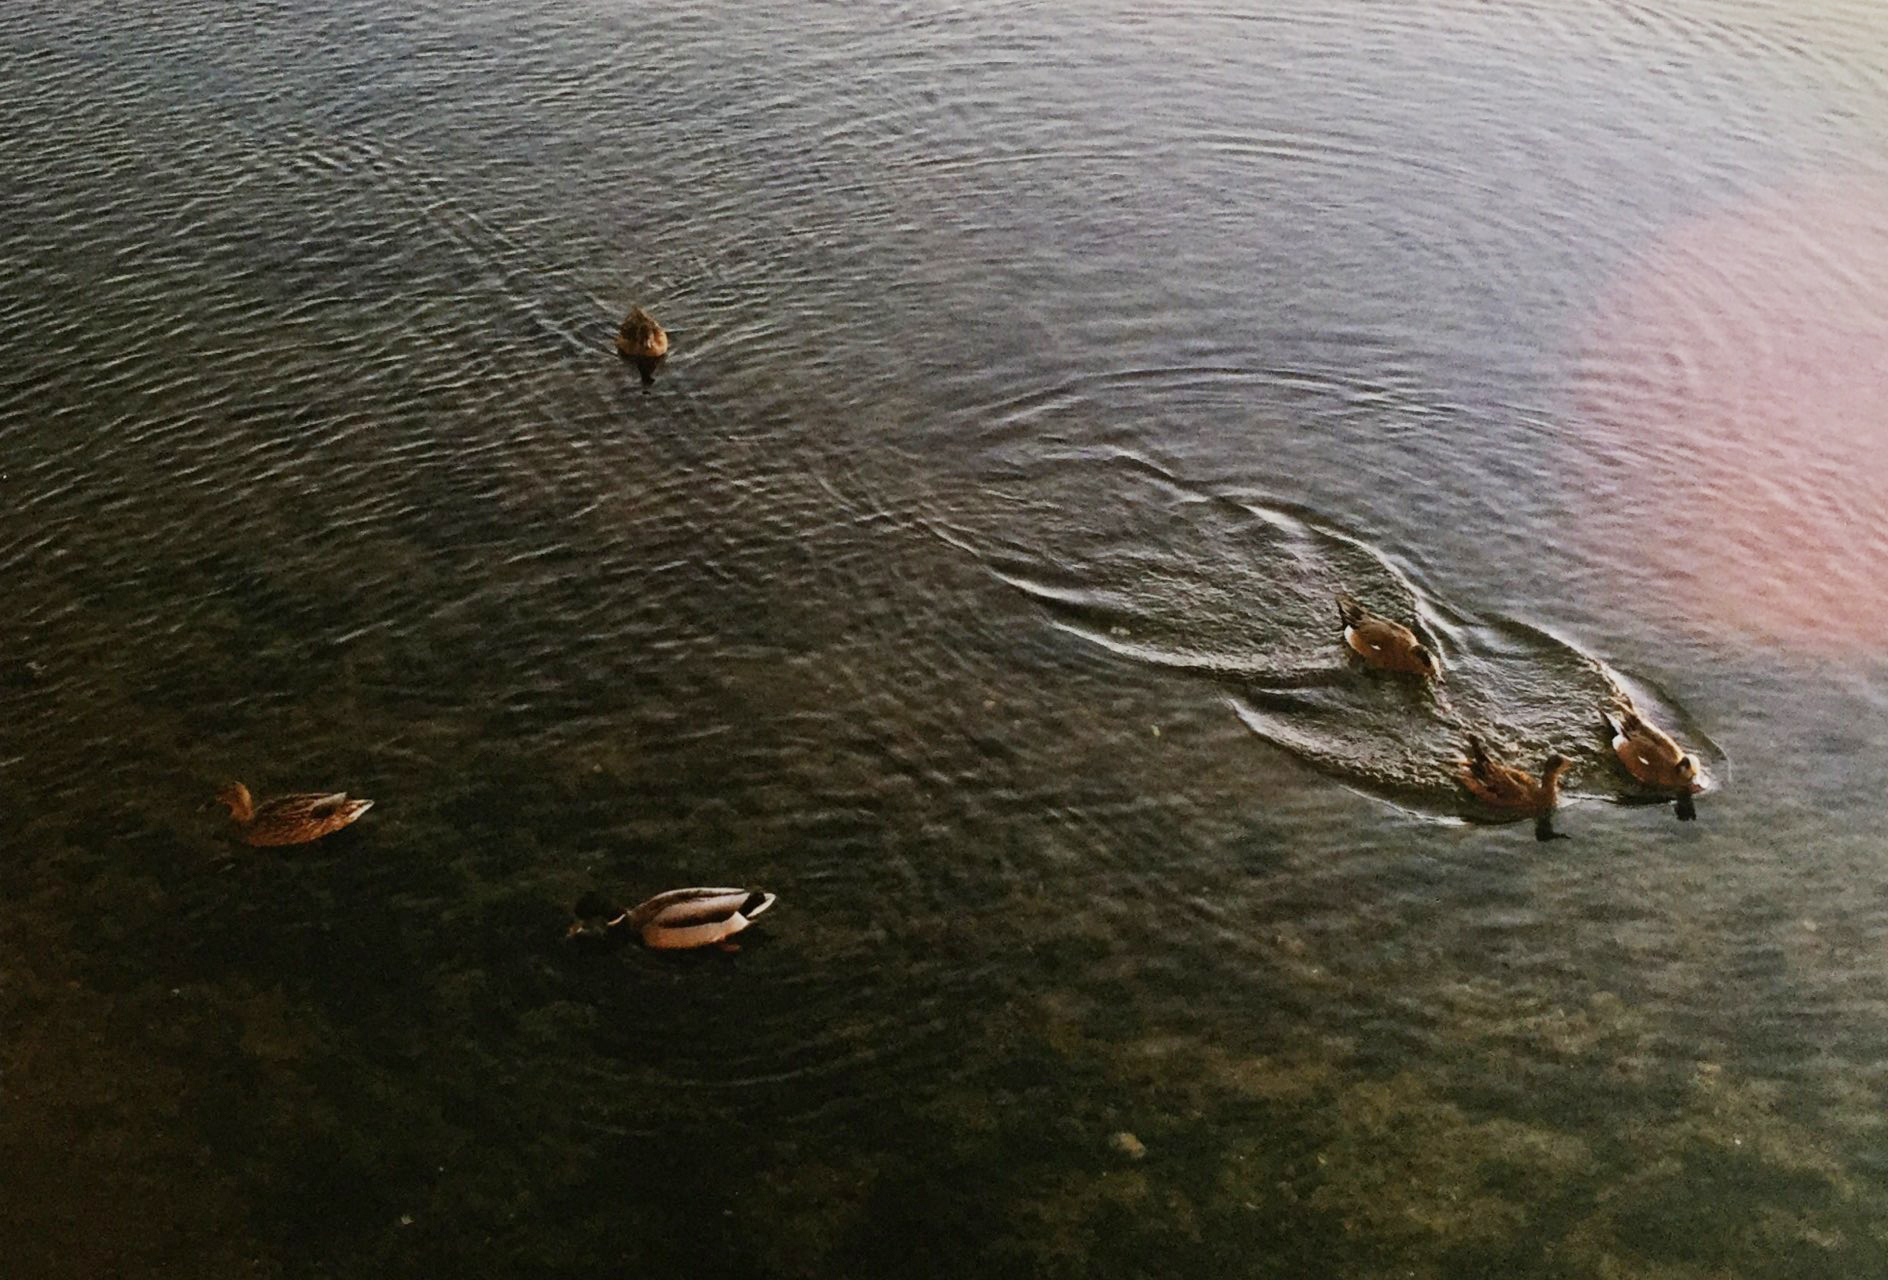 Swim your own path.